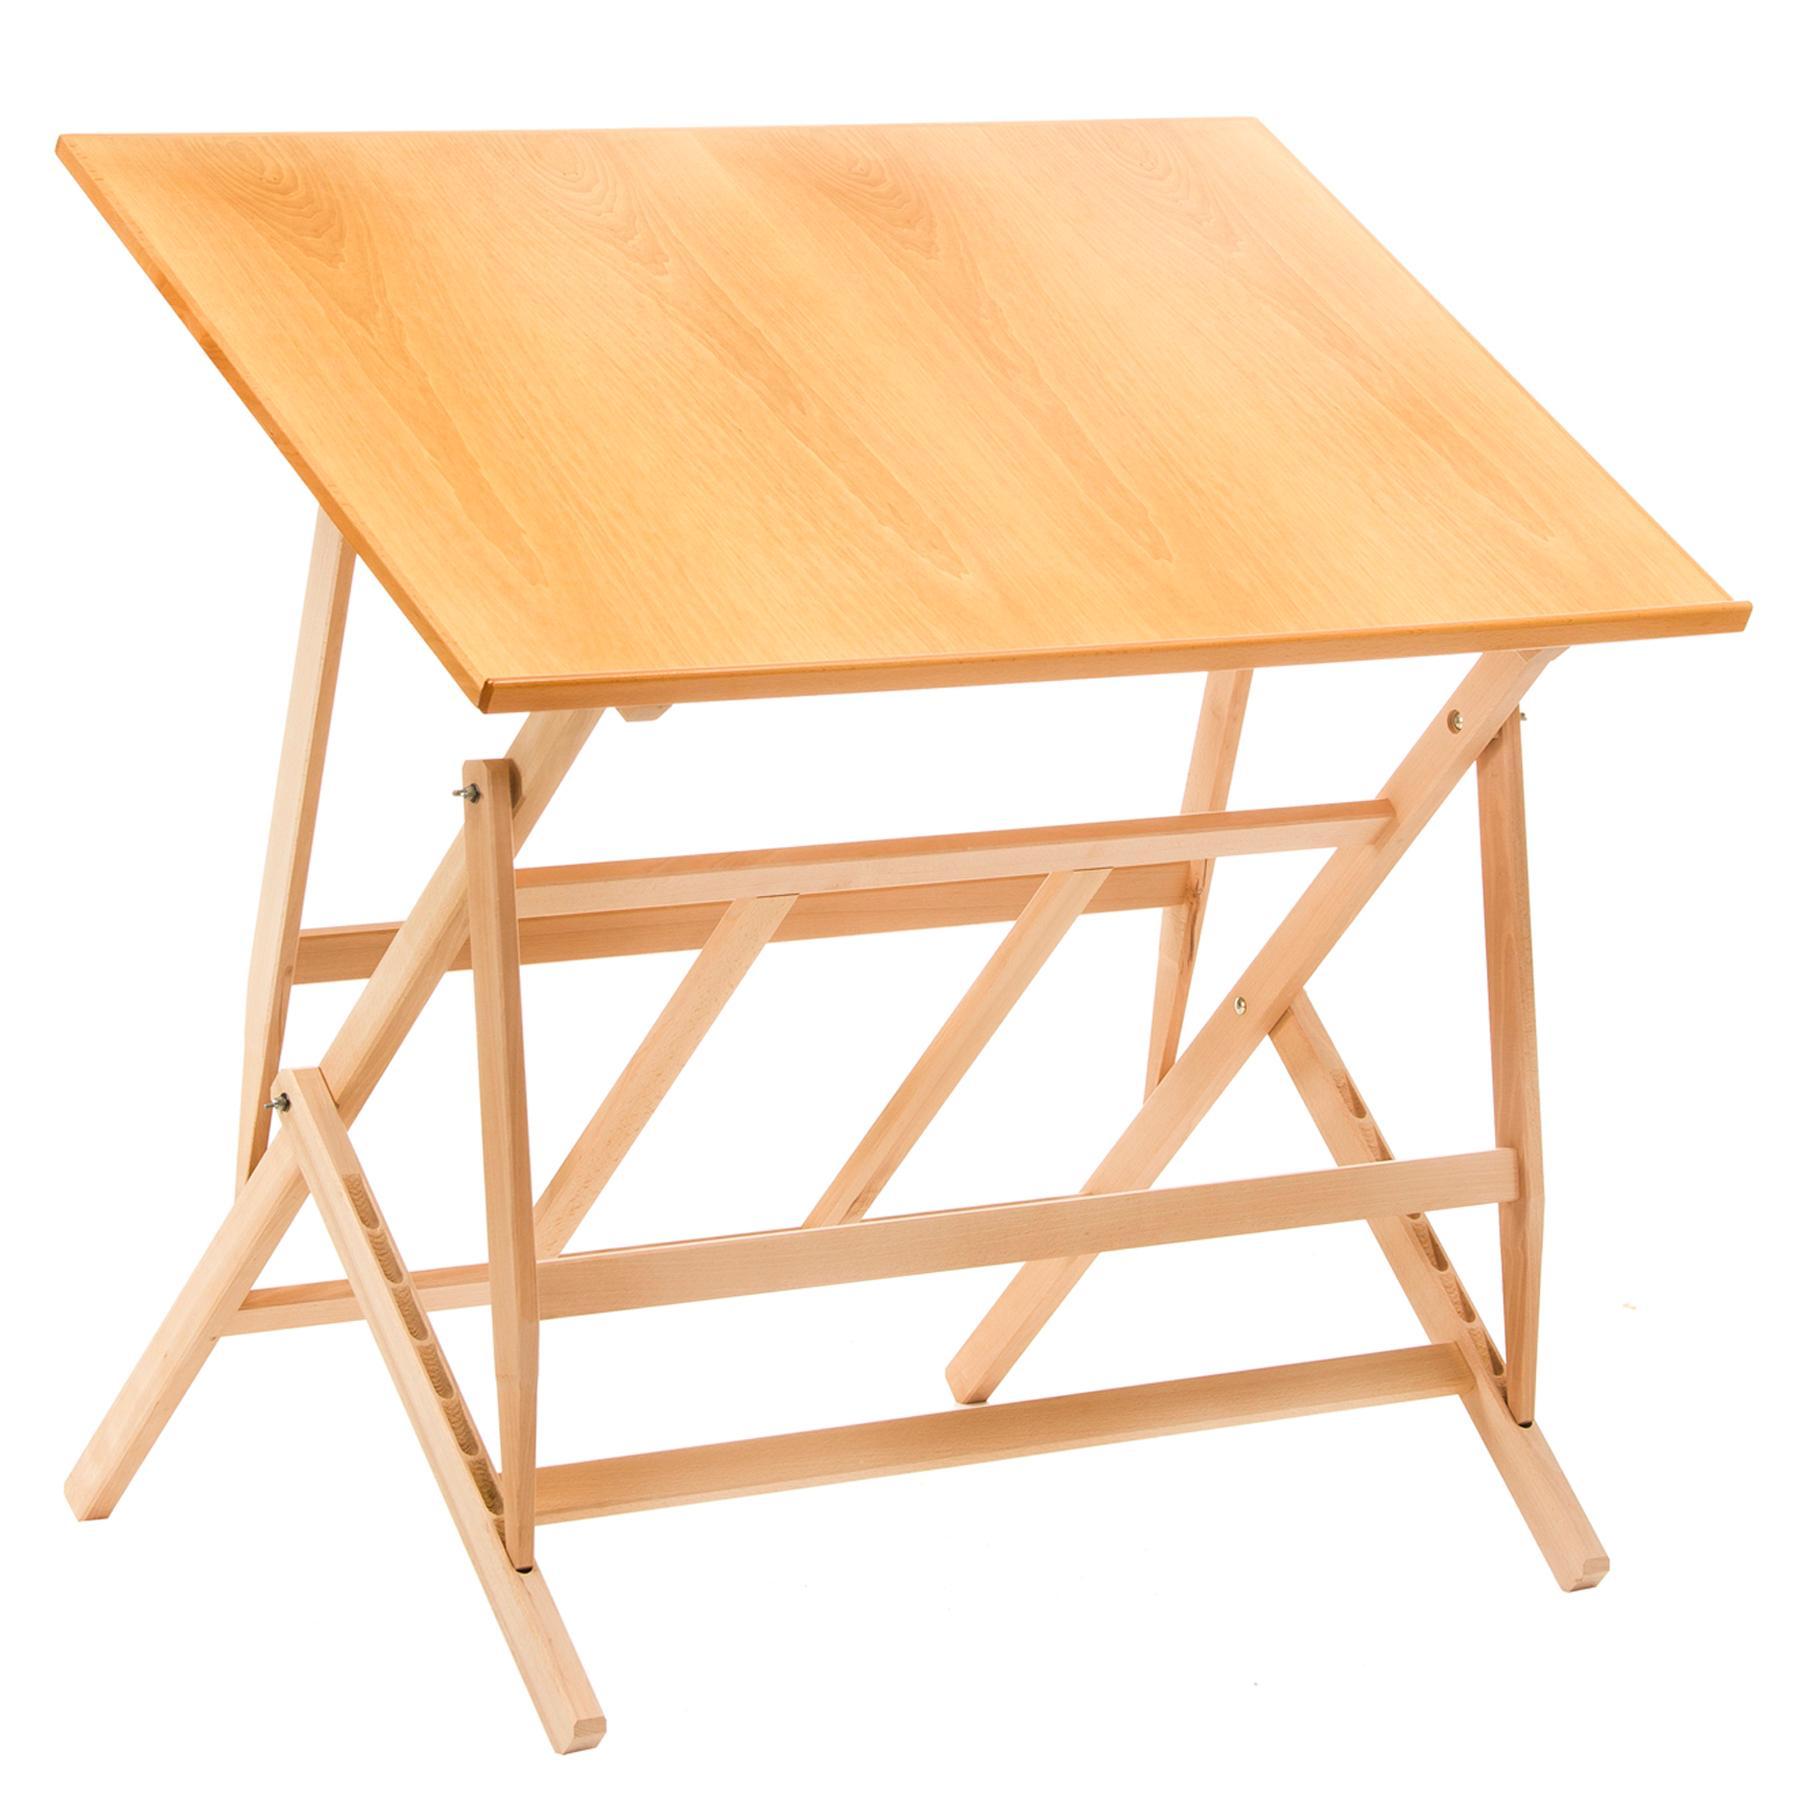 Lienzos levante 1610101111 mesa de dibujo profesional Mesa para dibujo tecnico